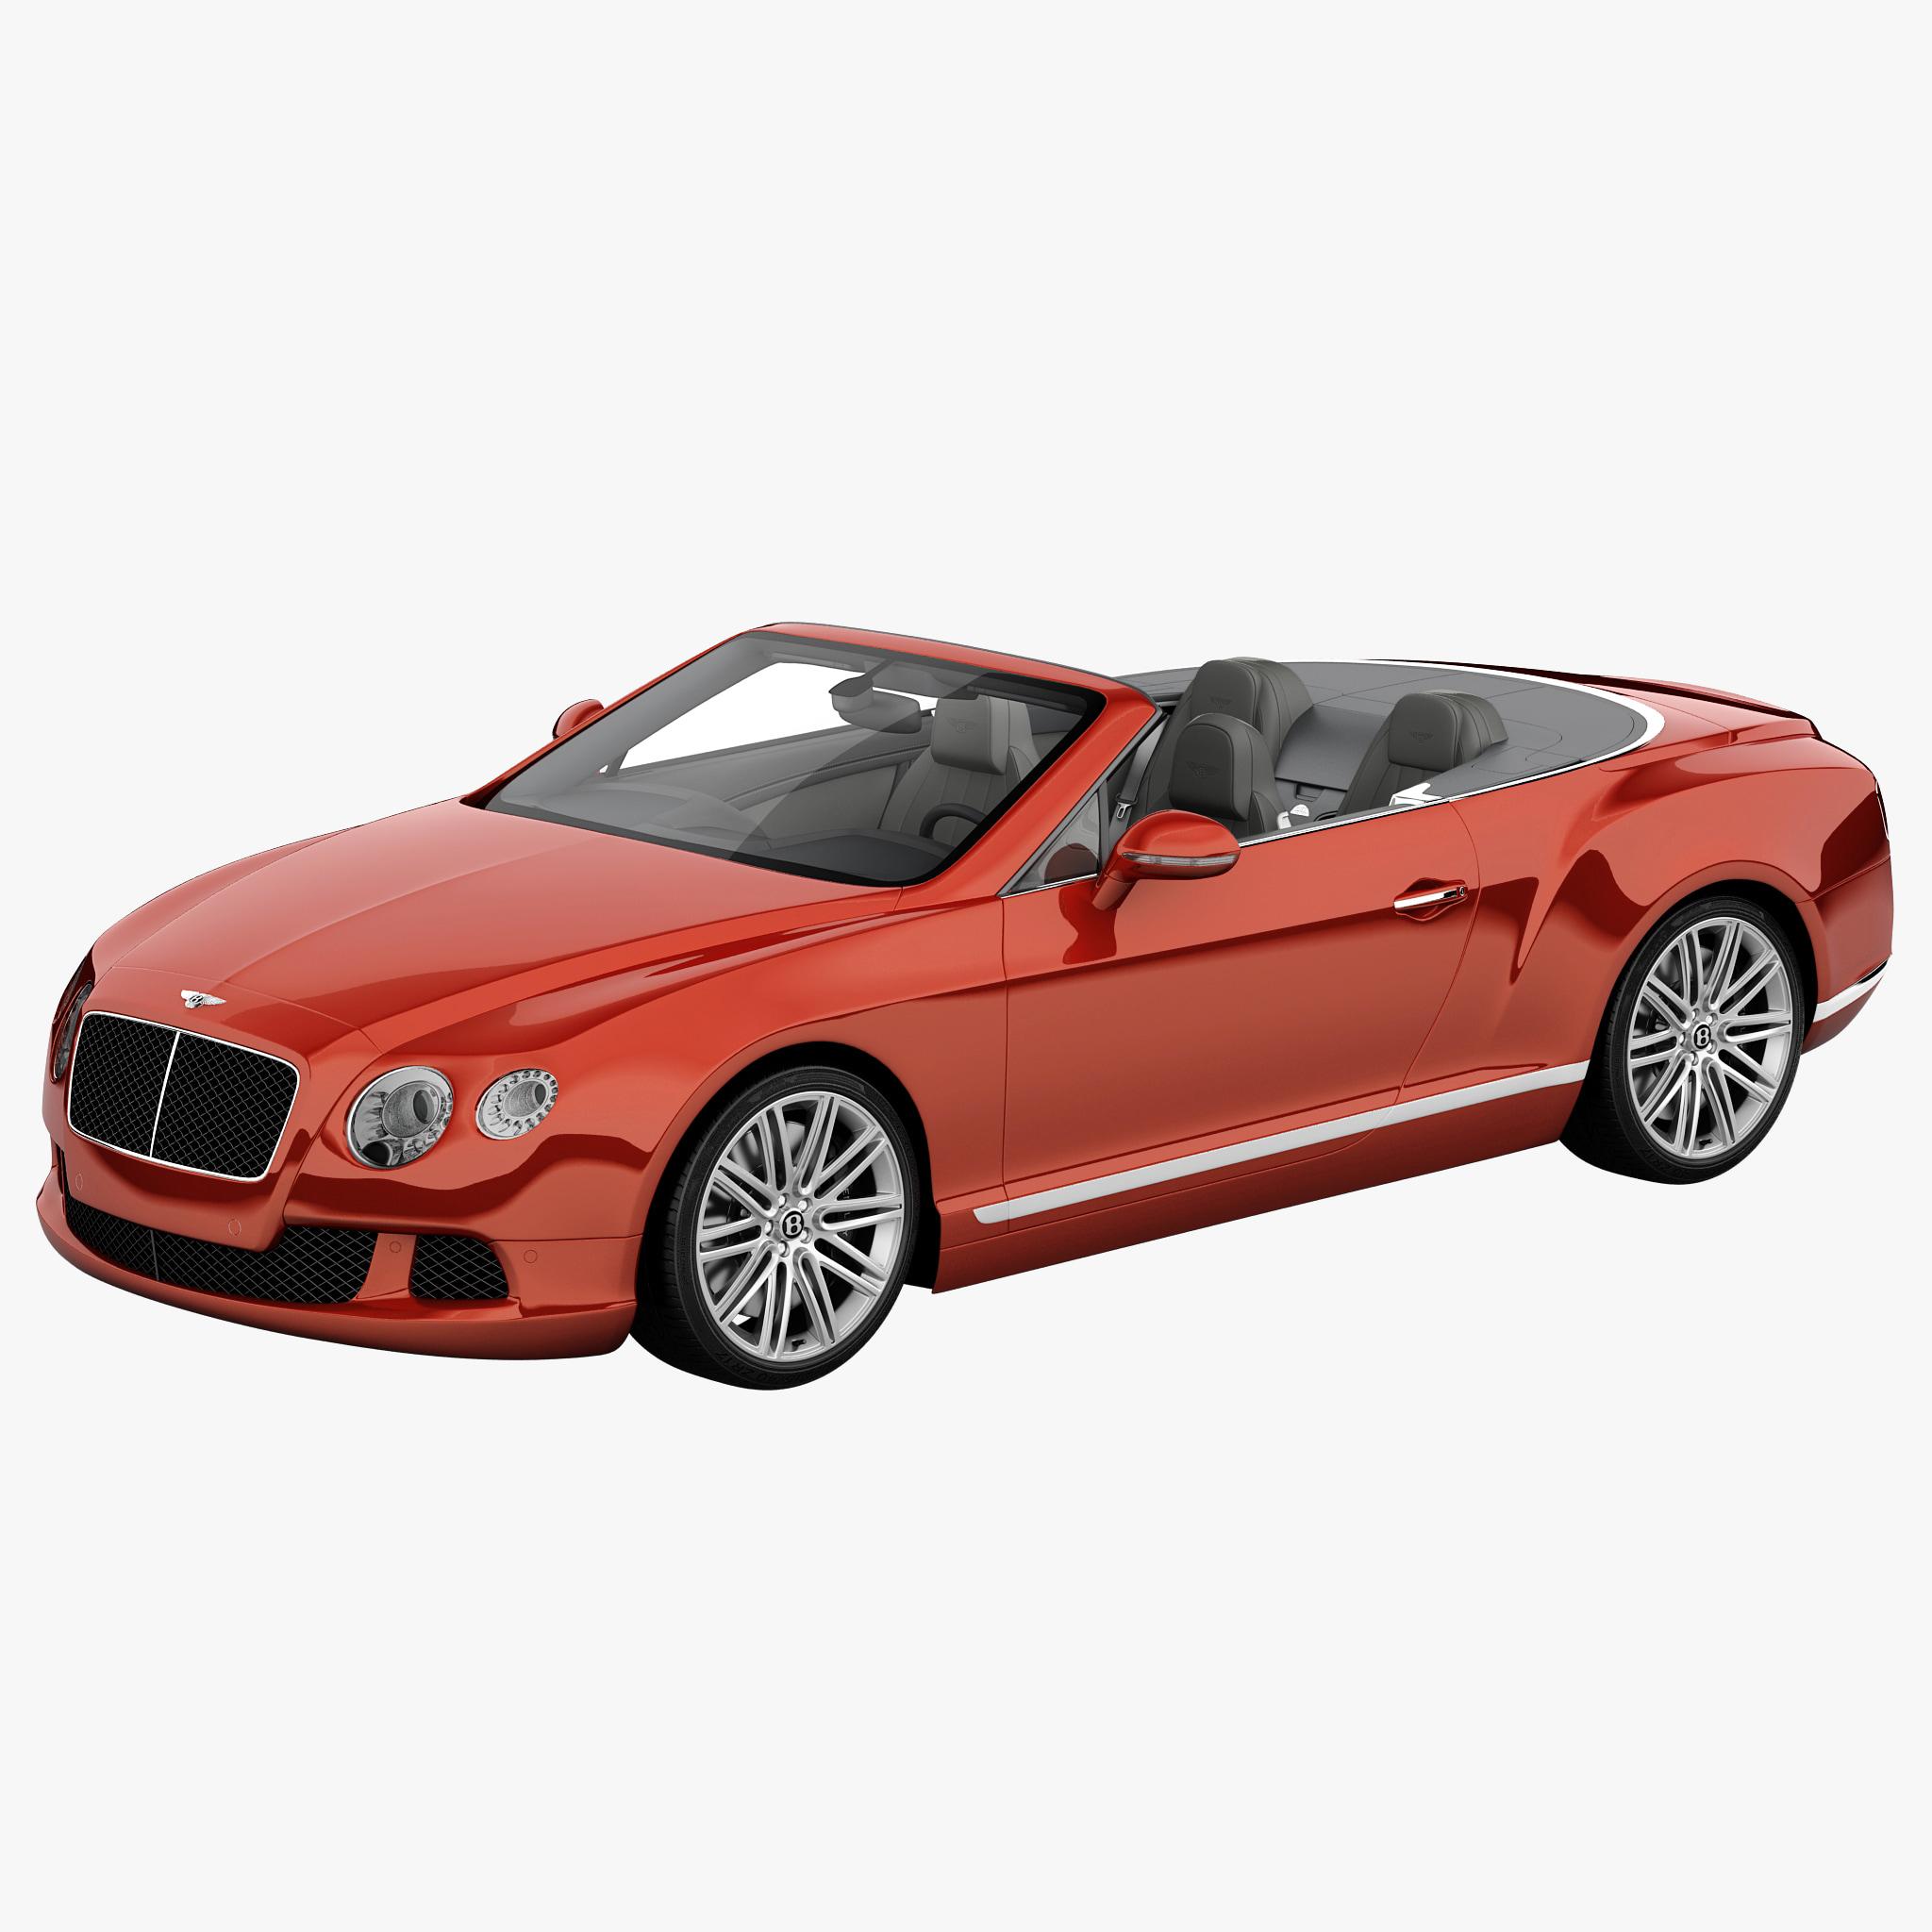 Bentley Continental GT 2014 Convertible_1.jpg